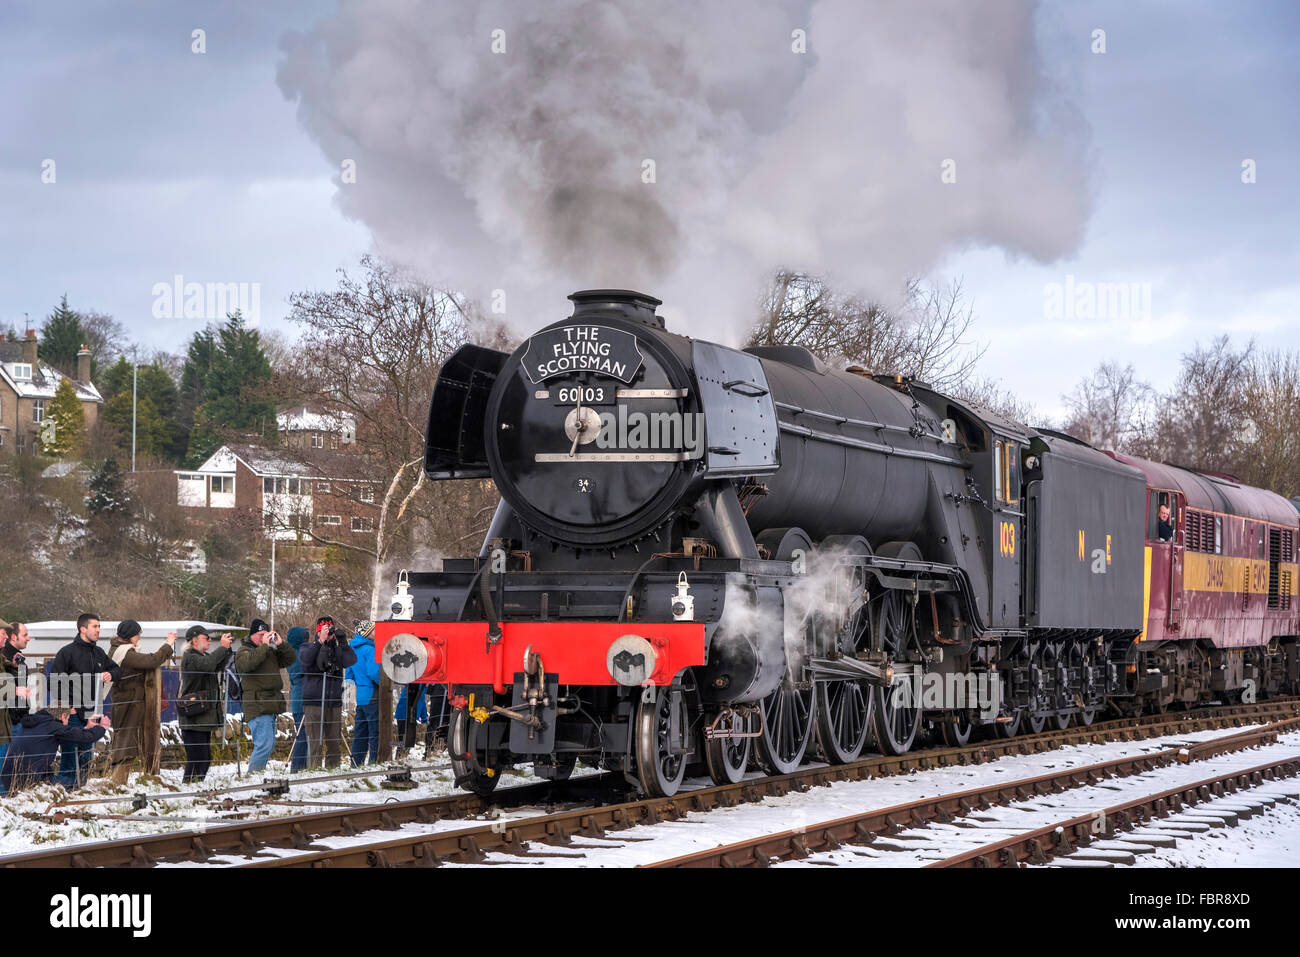 The newly restored Flying Scotsman locomotive on the East Lancashire railway. - Stock Image